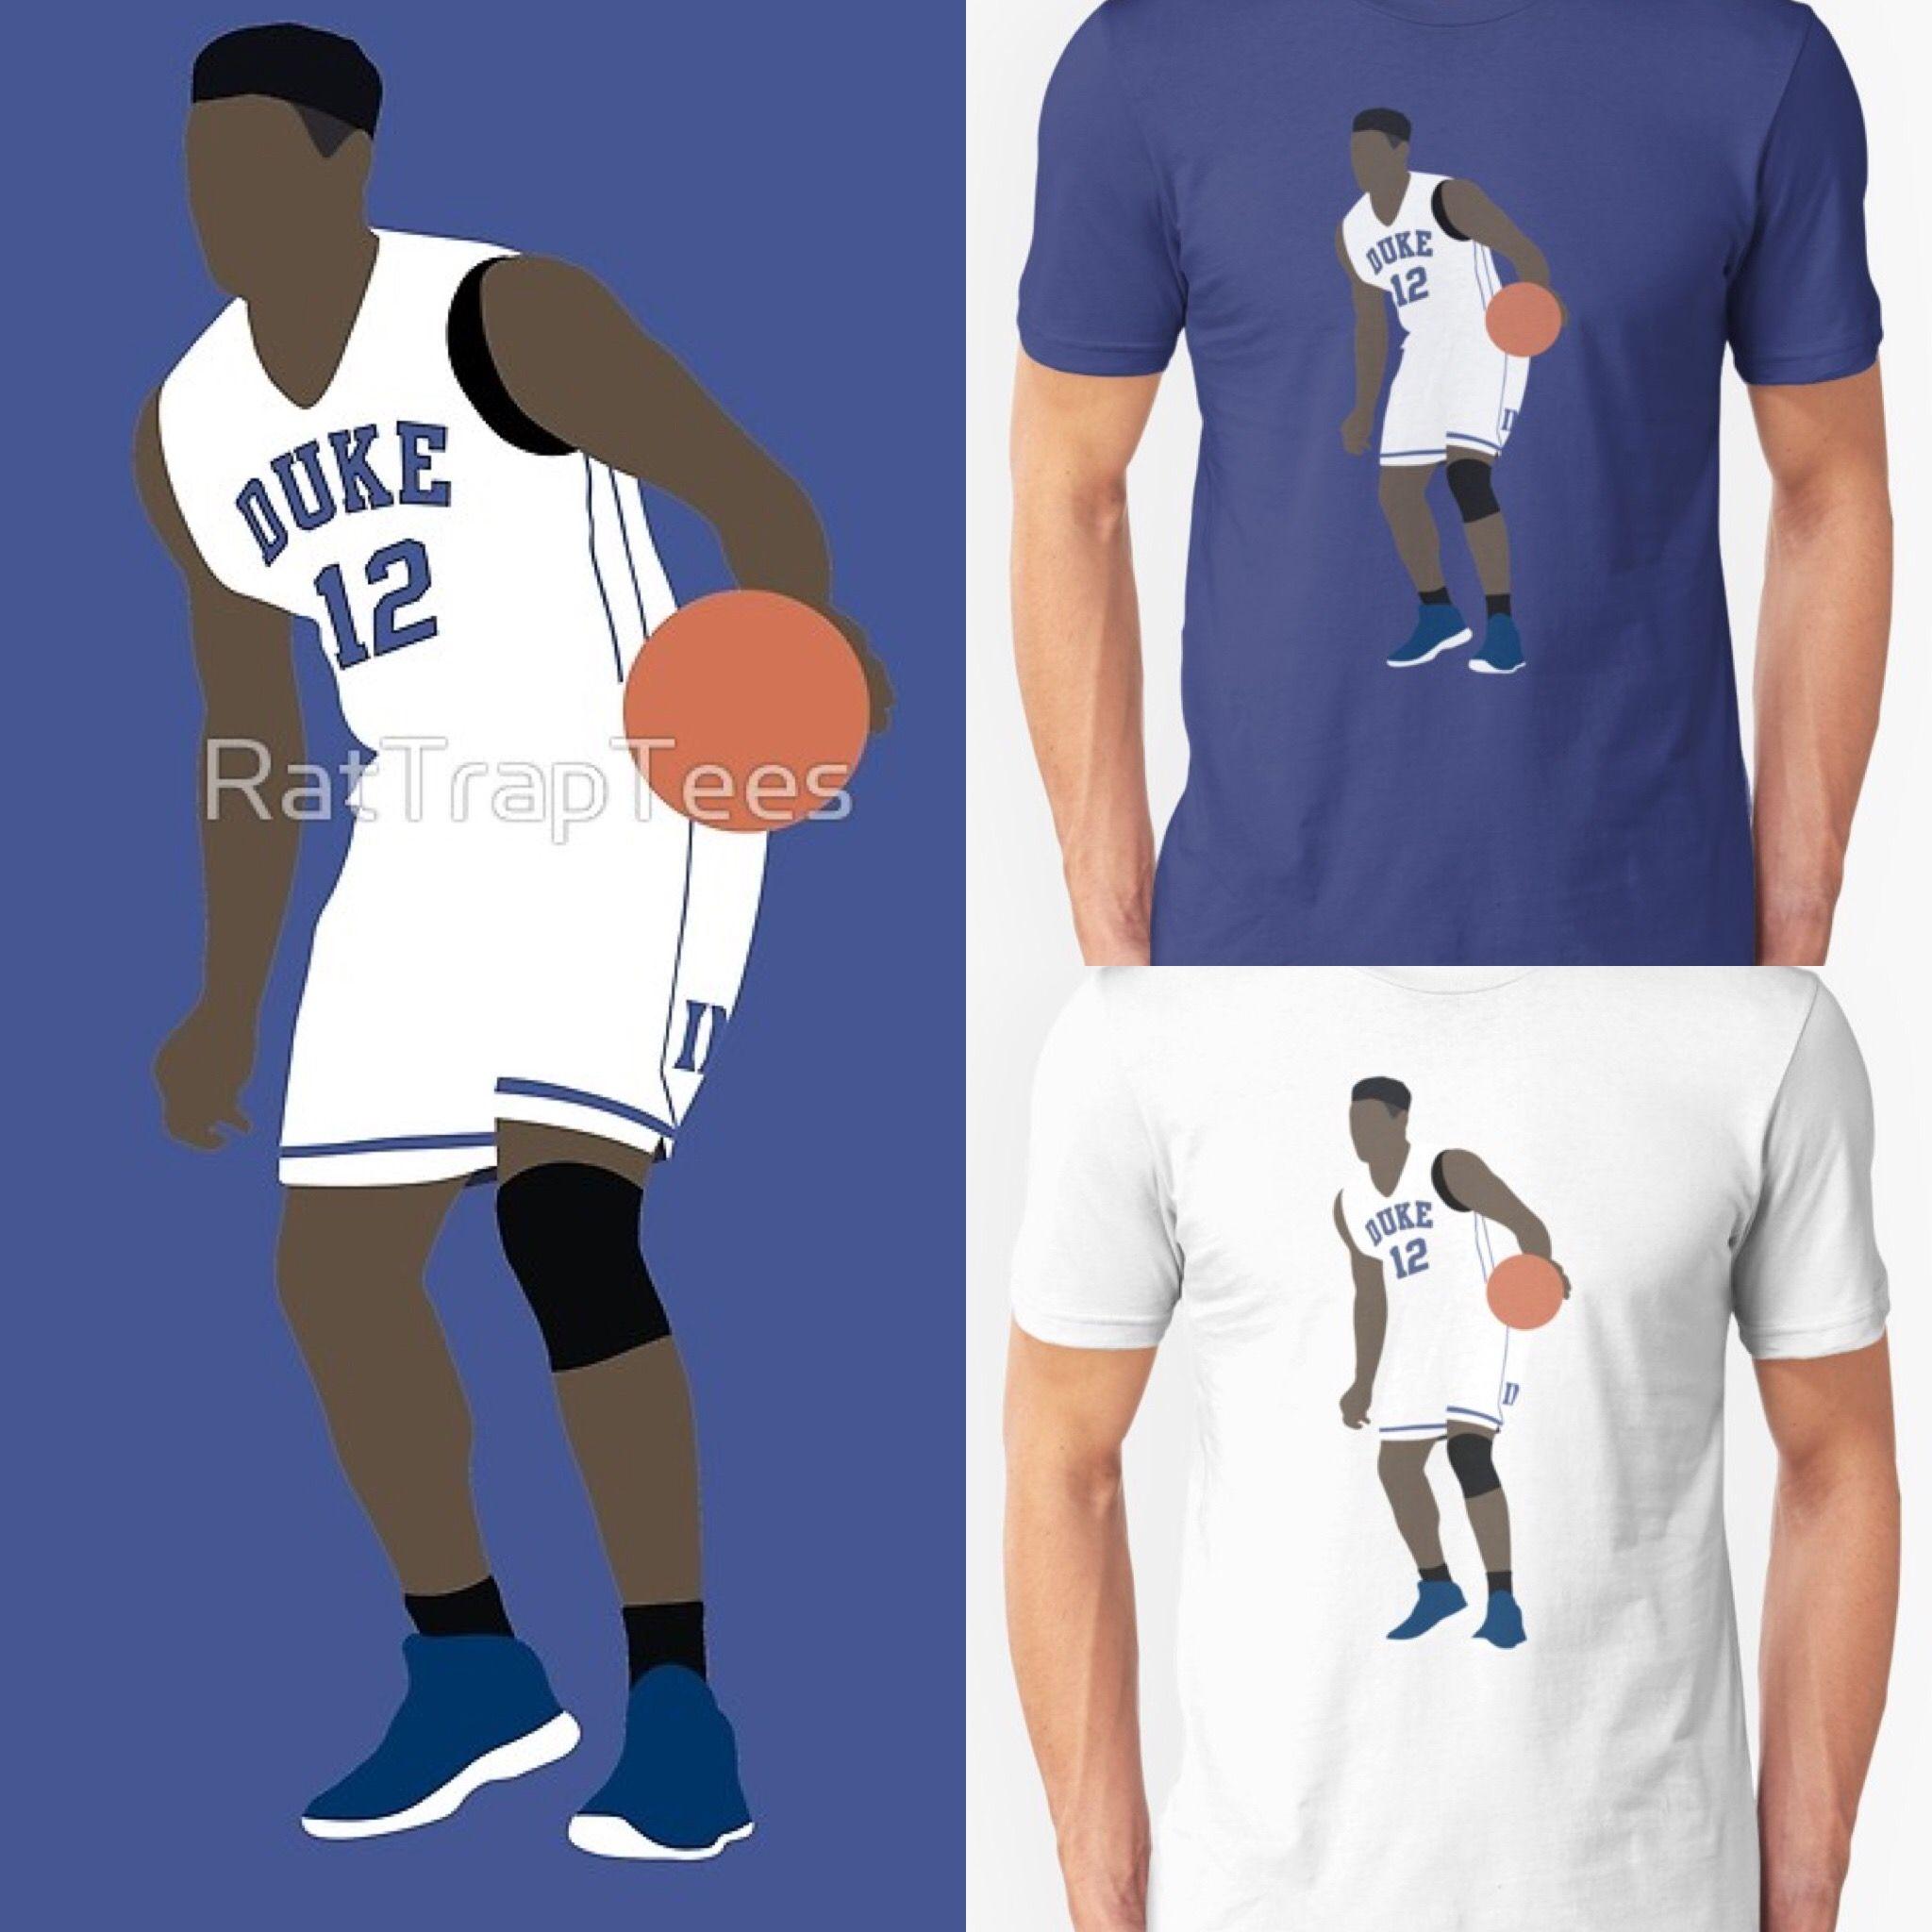 new arrival 63f6b 9ae6e Zion Williamson Duke Shirt   NBA T-Shirts   Duke shirts, Nba ...